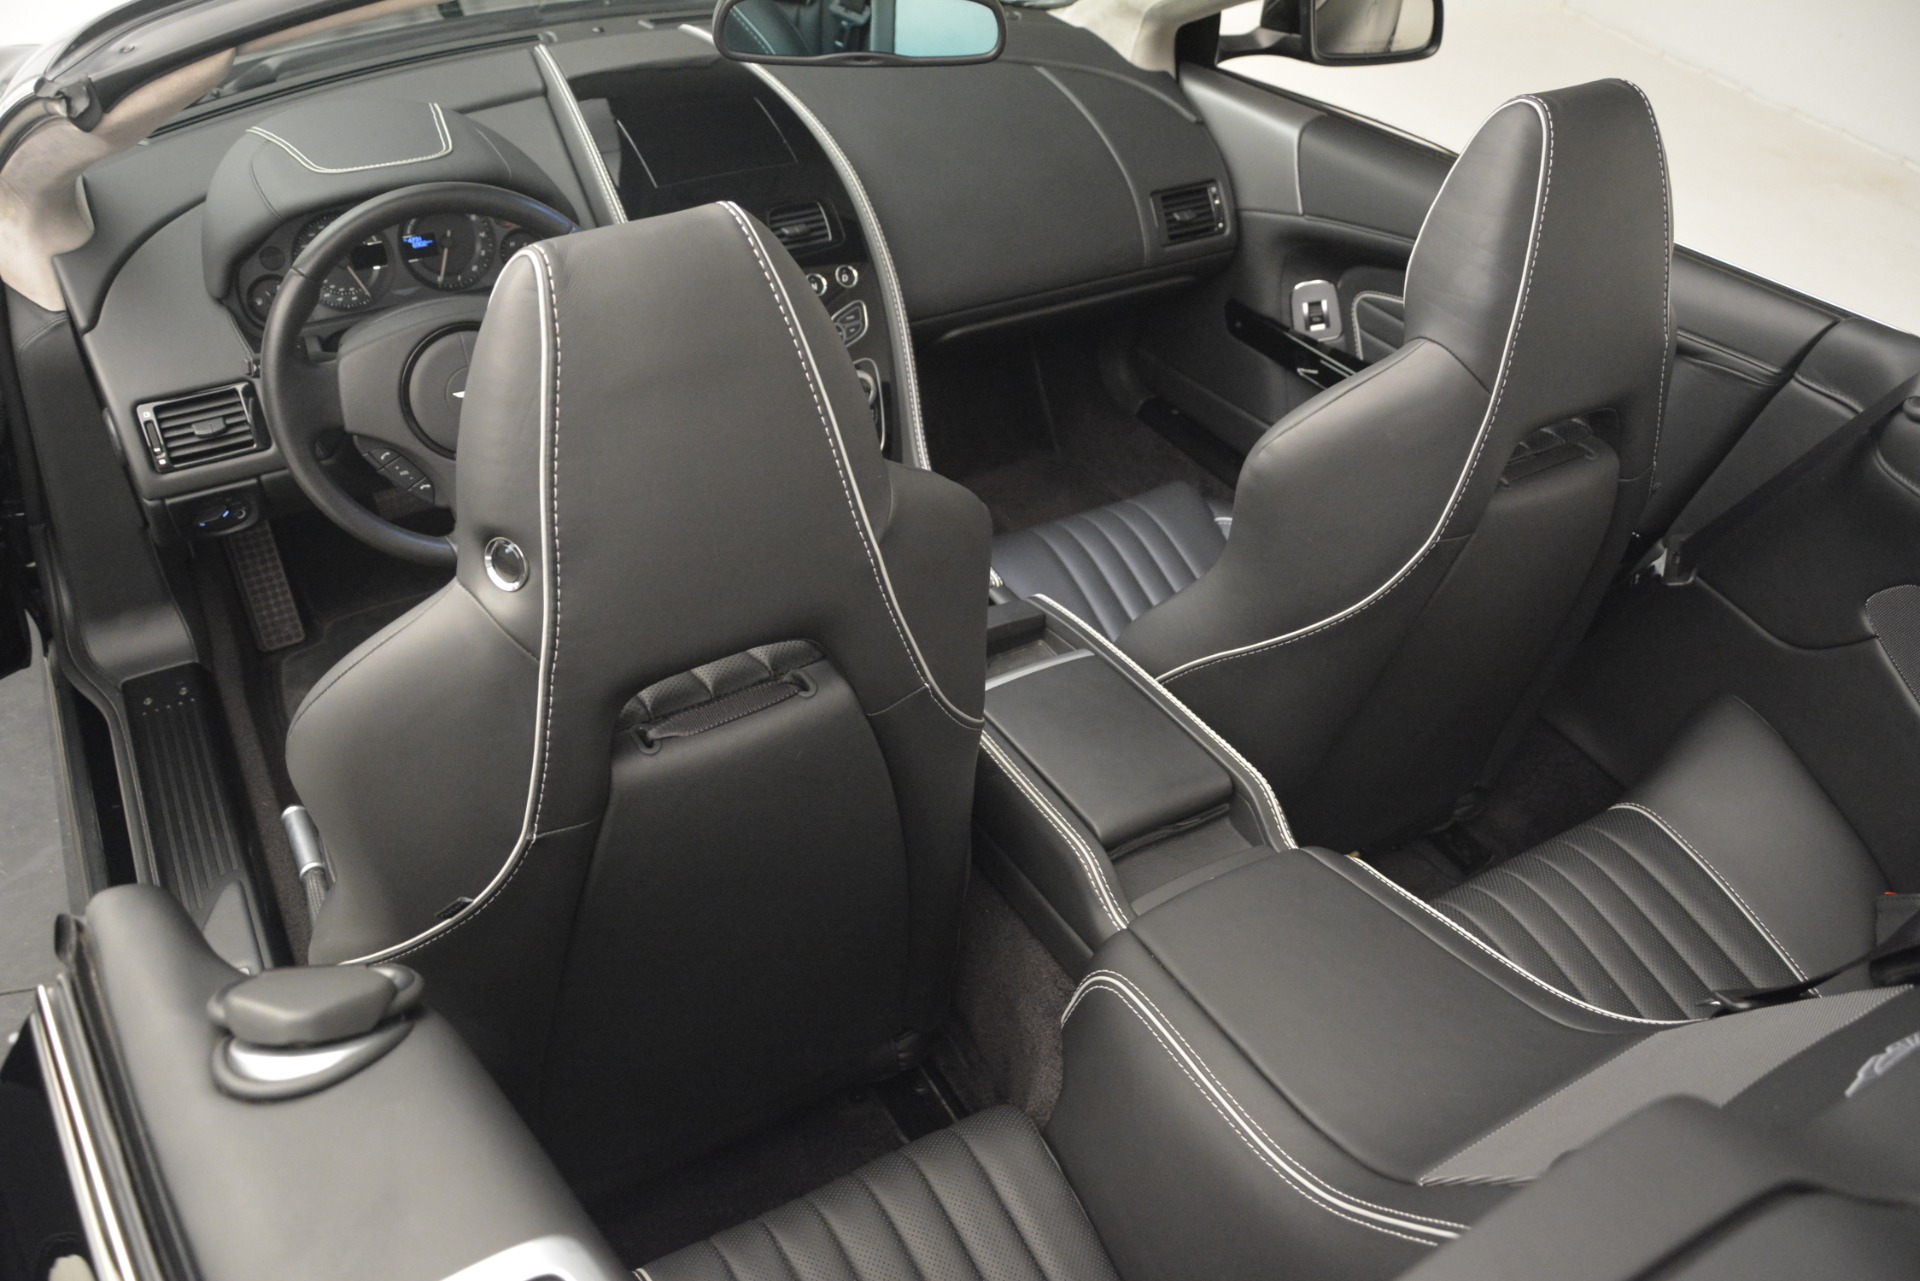 Used 2016 Aston Martin DB9 Convertible For Sale In Greenwich, CT. Alfa Romeo of Greenwich, 7495 2971_p19